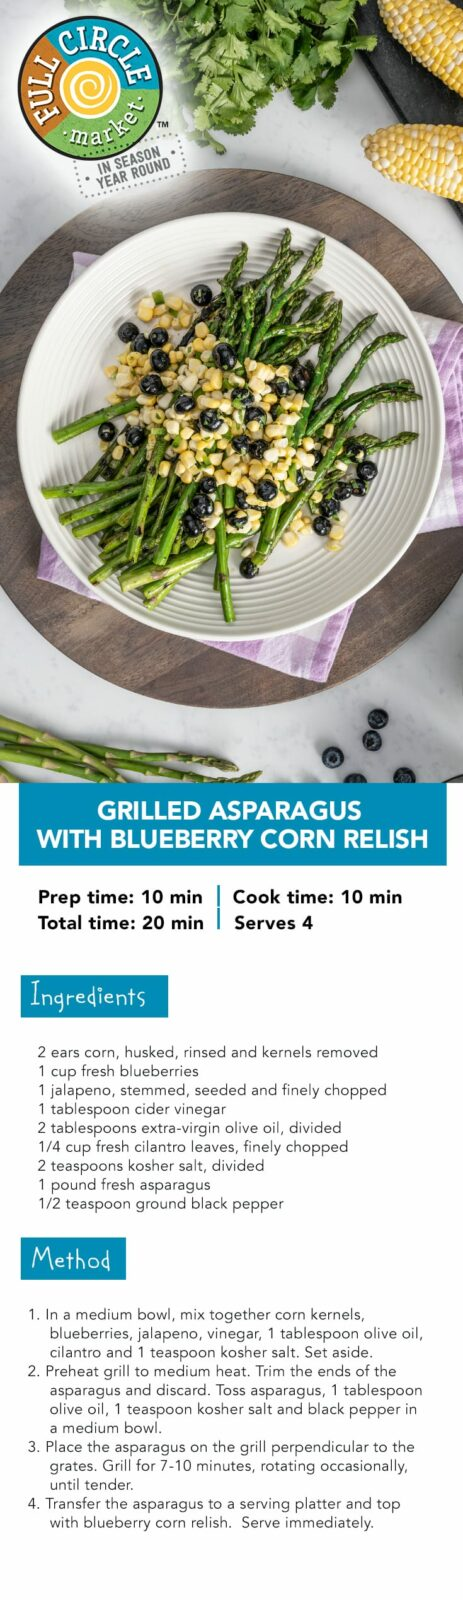 FullCircle_PinterestPinPinterest_Grilled Asparagus with Blueberry Corn Relish